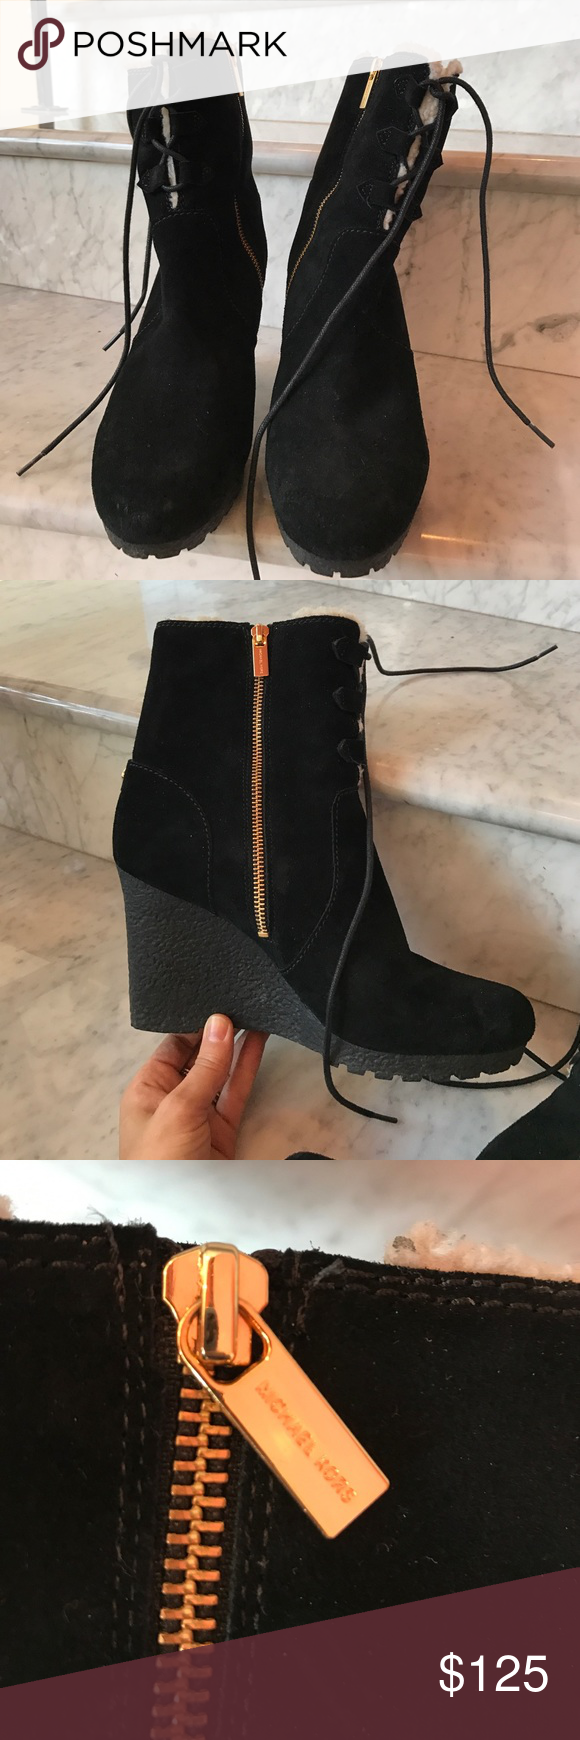 Michael Kors Rory Boot Brand new in box! Michael Kors Shoes Winter & Rain Boots